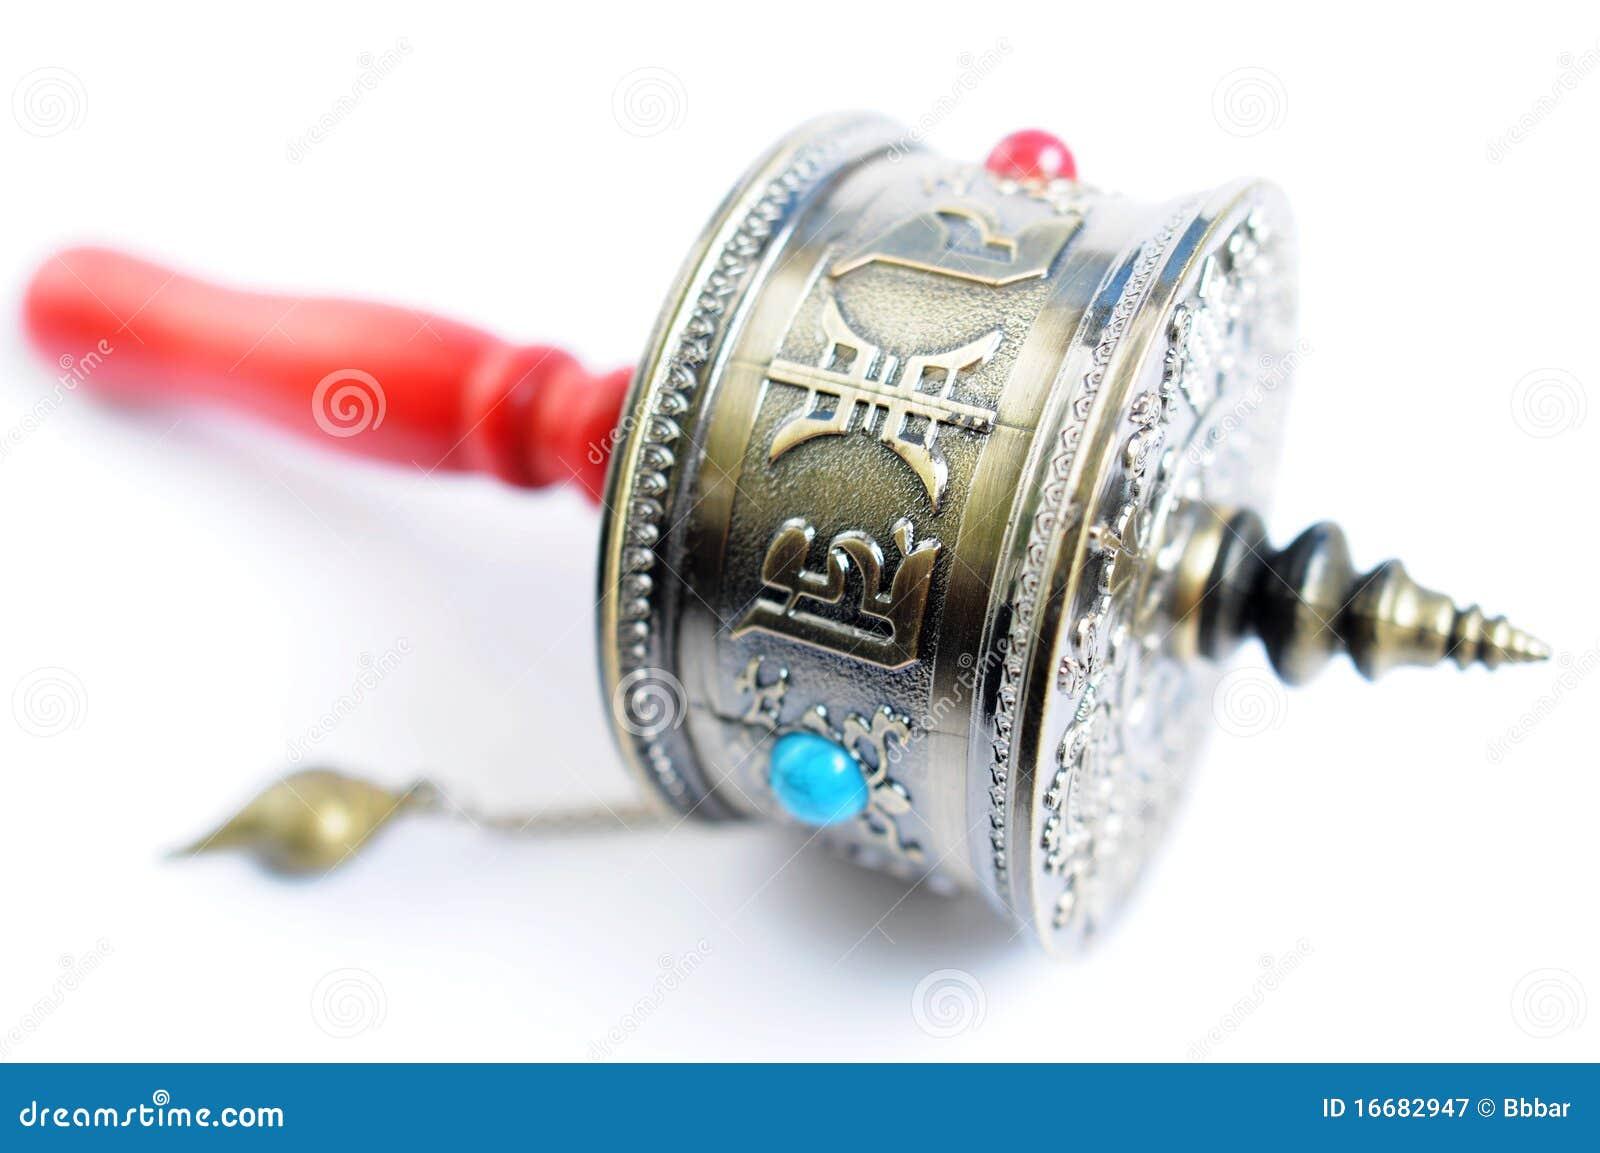 lhasa hindu singles 9780812039504 0812039505 lhasa apsos, stephen wehrmann 9781420885132 1420885138 the hostage, robert melley  various artists, complete motown singles 10.